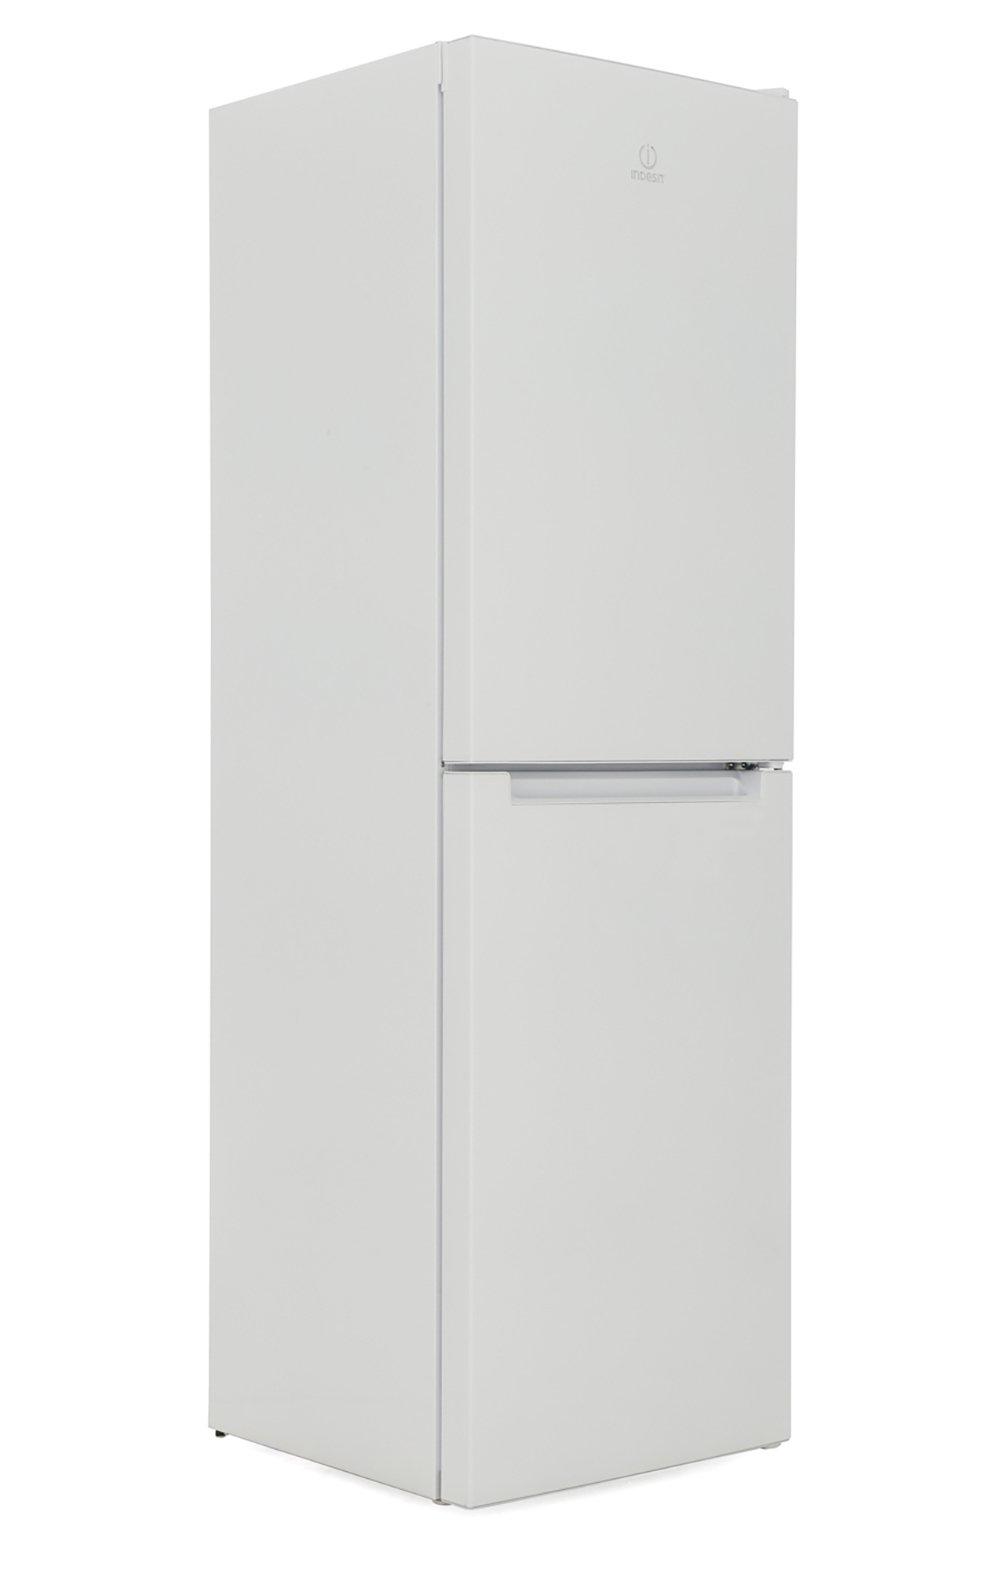 Indesit LD85F1W Frost Free Fridge Freezer